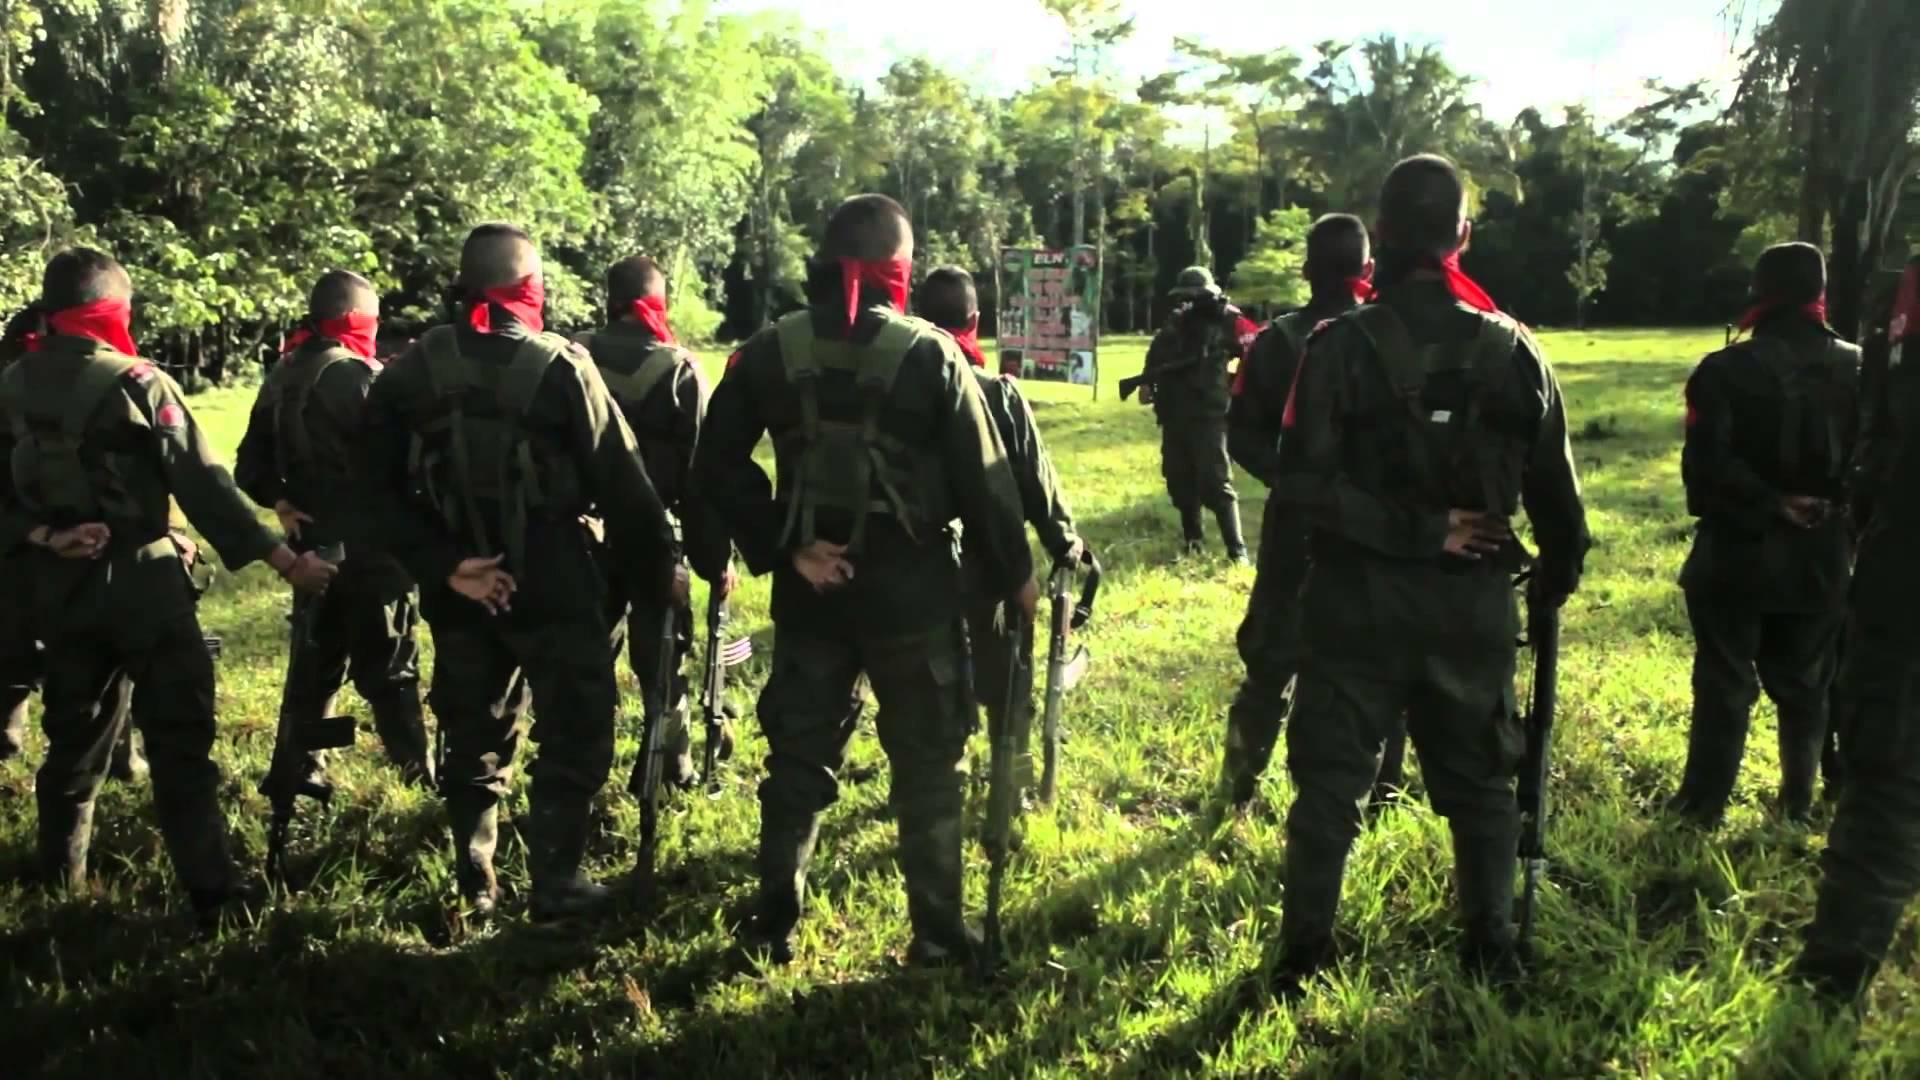 Organismo atribuye a ''narcoparamilitares'' el asesinato de periodistas ecuatorianos